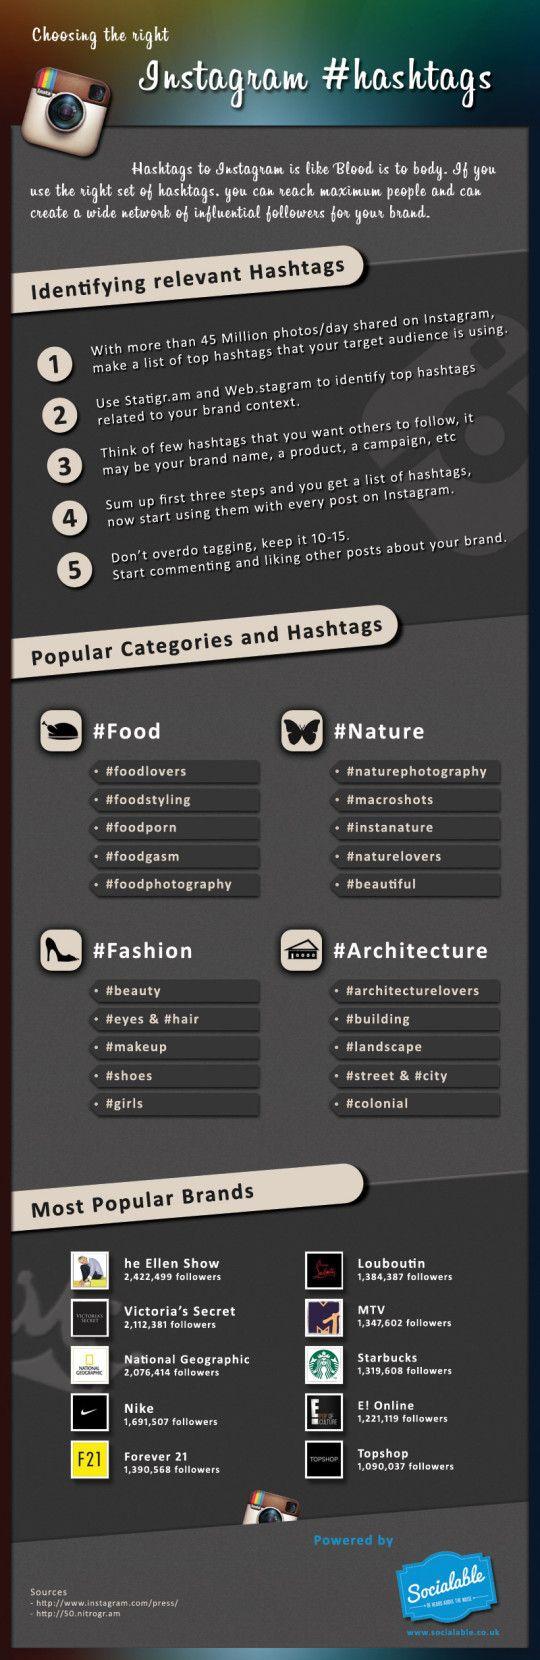 Choosing The Right Instagram #Hashtags #infographic ...   #instagram #marketing #socialmedia #instagrammartketing #instagramtip #socialmediatip